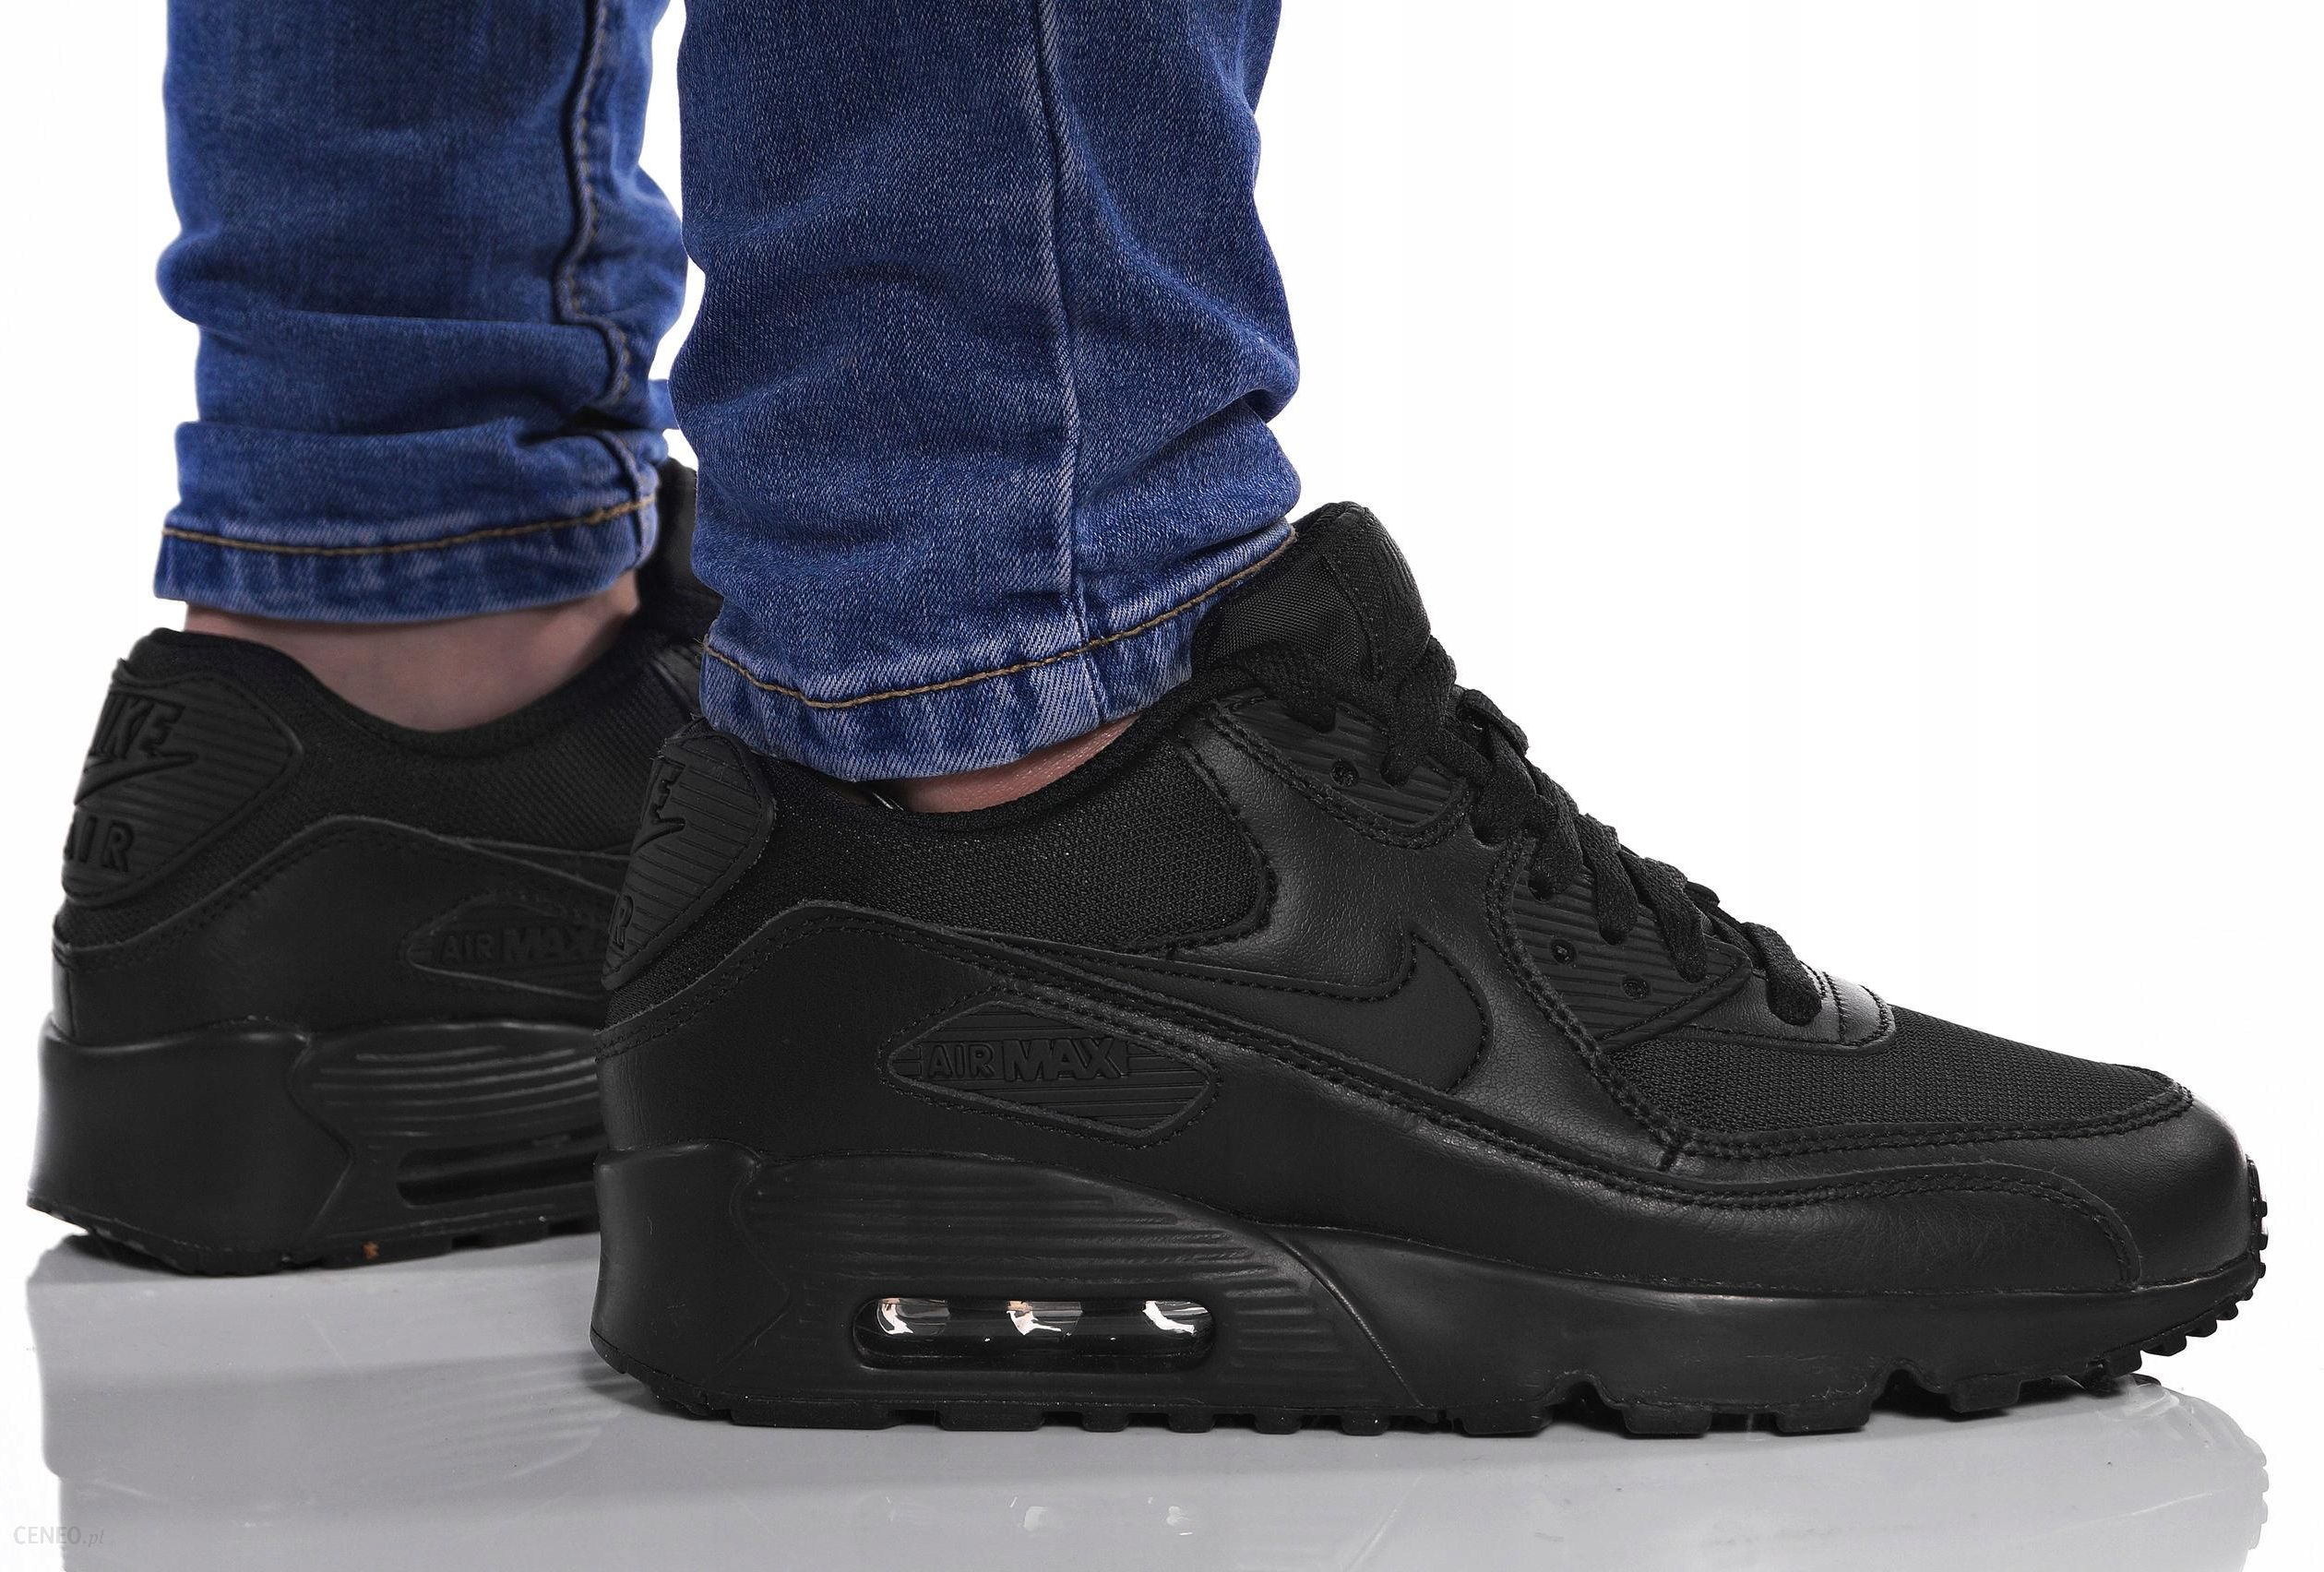 Buty Nike Air Max 90 Mesh (GS) Black (833418 001) Ceny i opinie Ceneo.pl